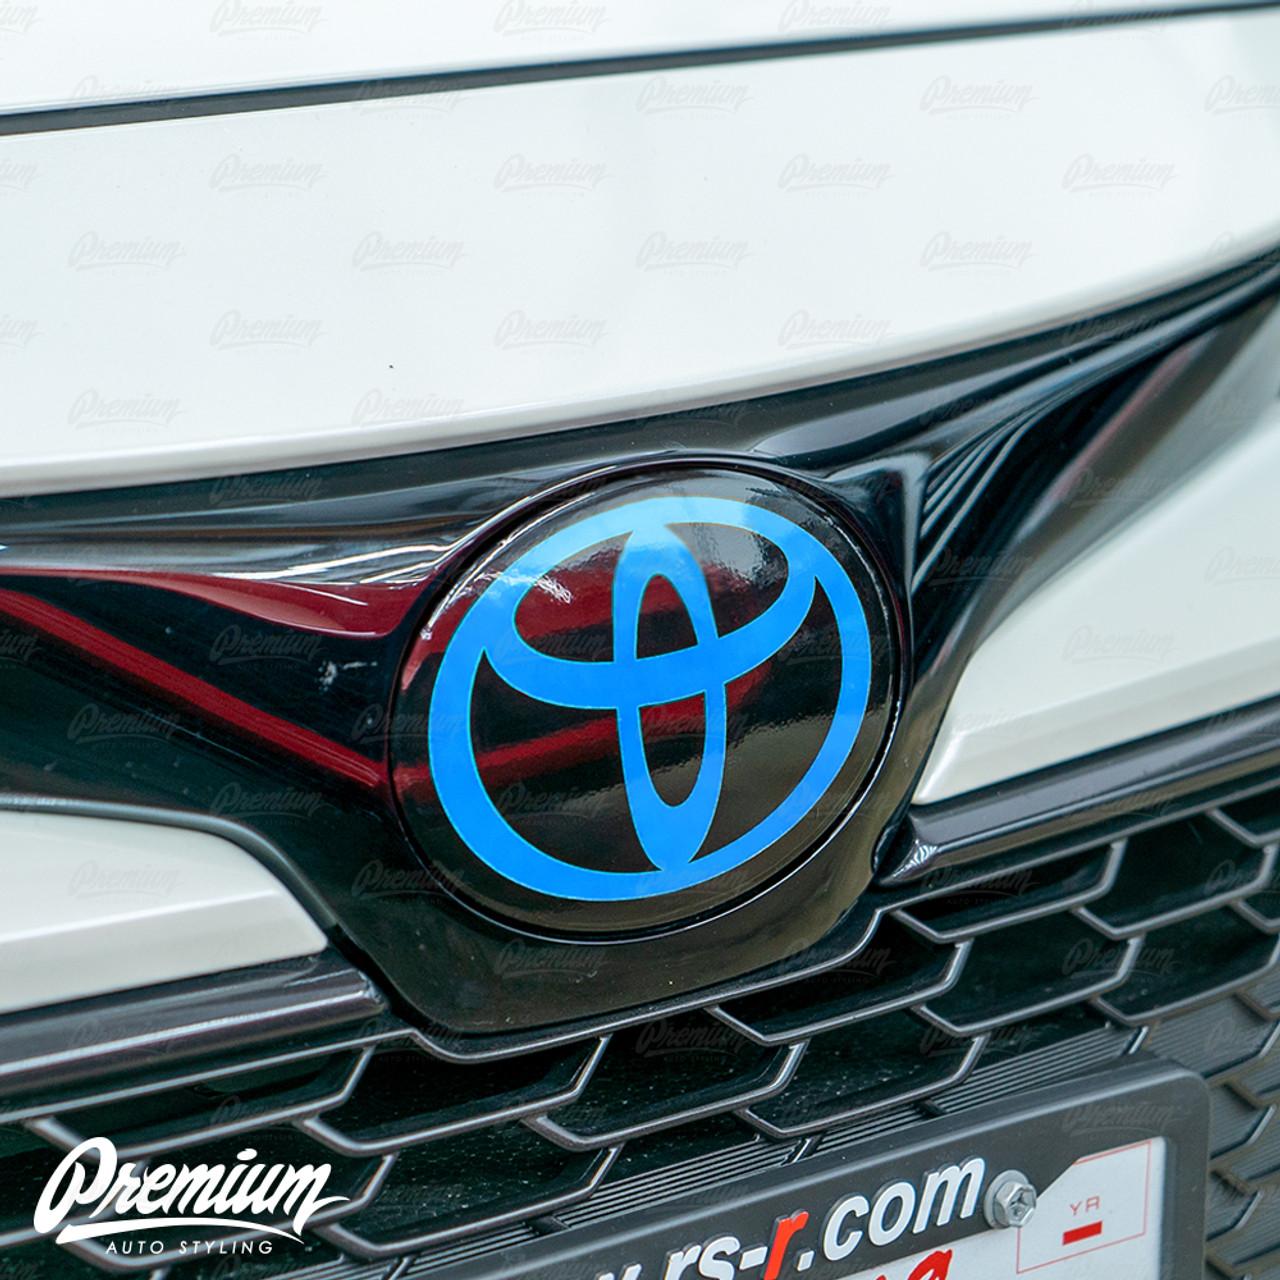 2020 Toyota Corolla Front Emblem Vinyl Overlay Choose Your